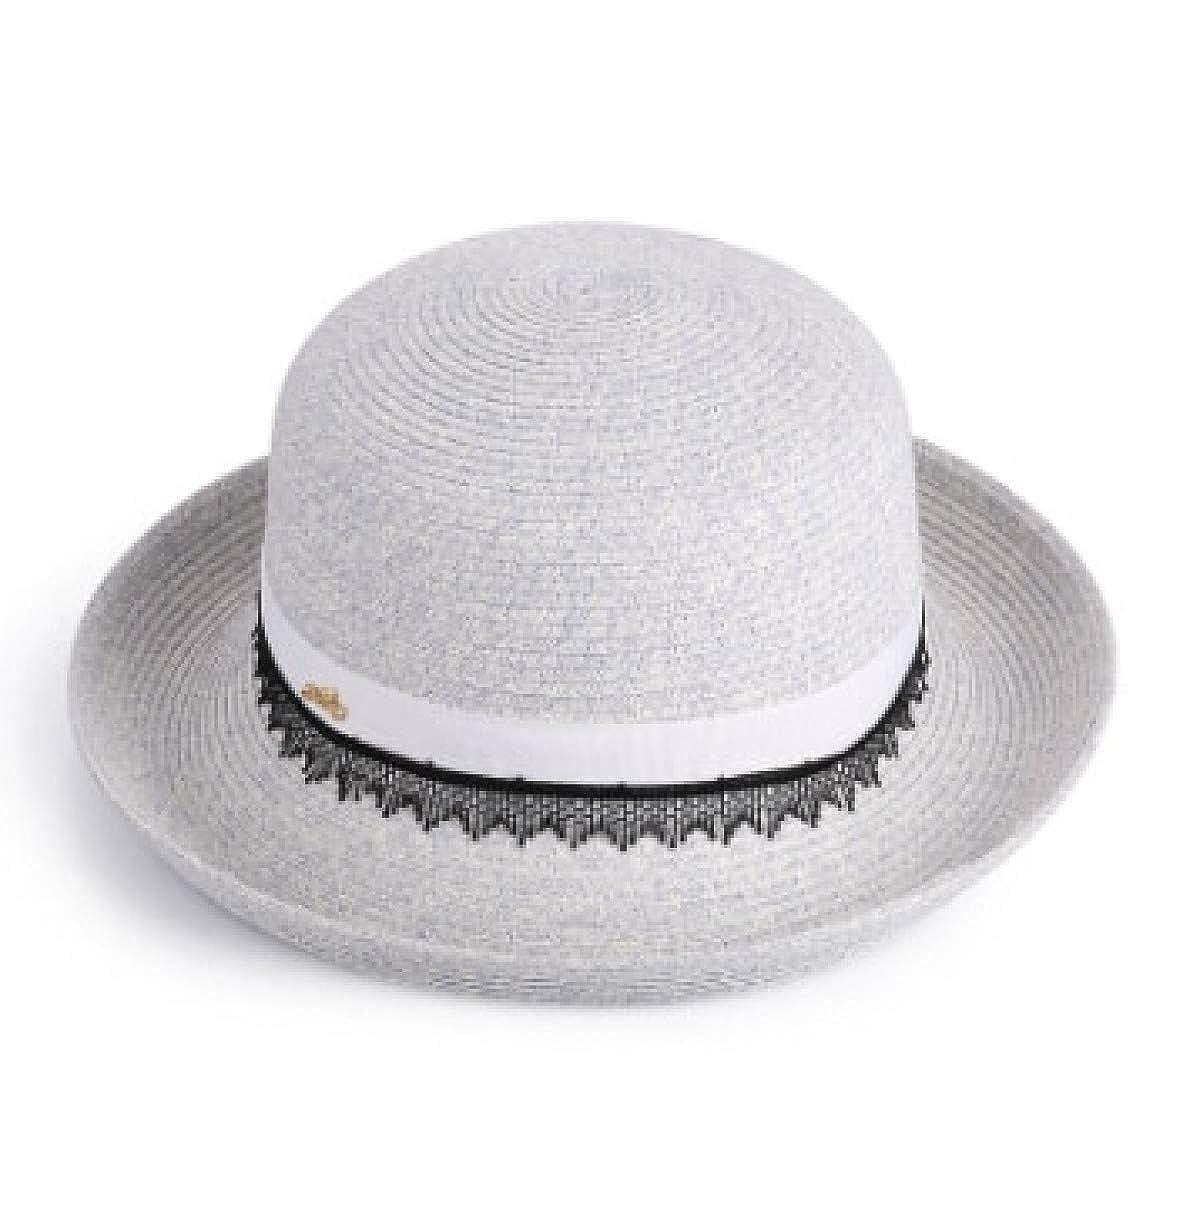 Ivory Mix bluee UNICOM91 Summer Hats for Women Feminino Lace Visors Cap Foldable Sun Hat Beach UV Predect Hat